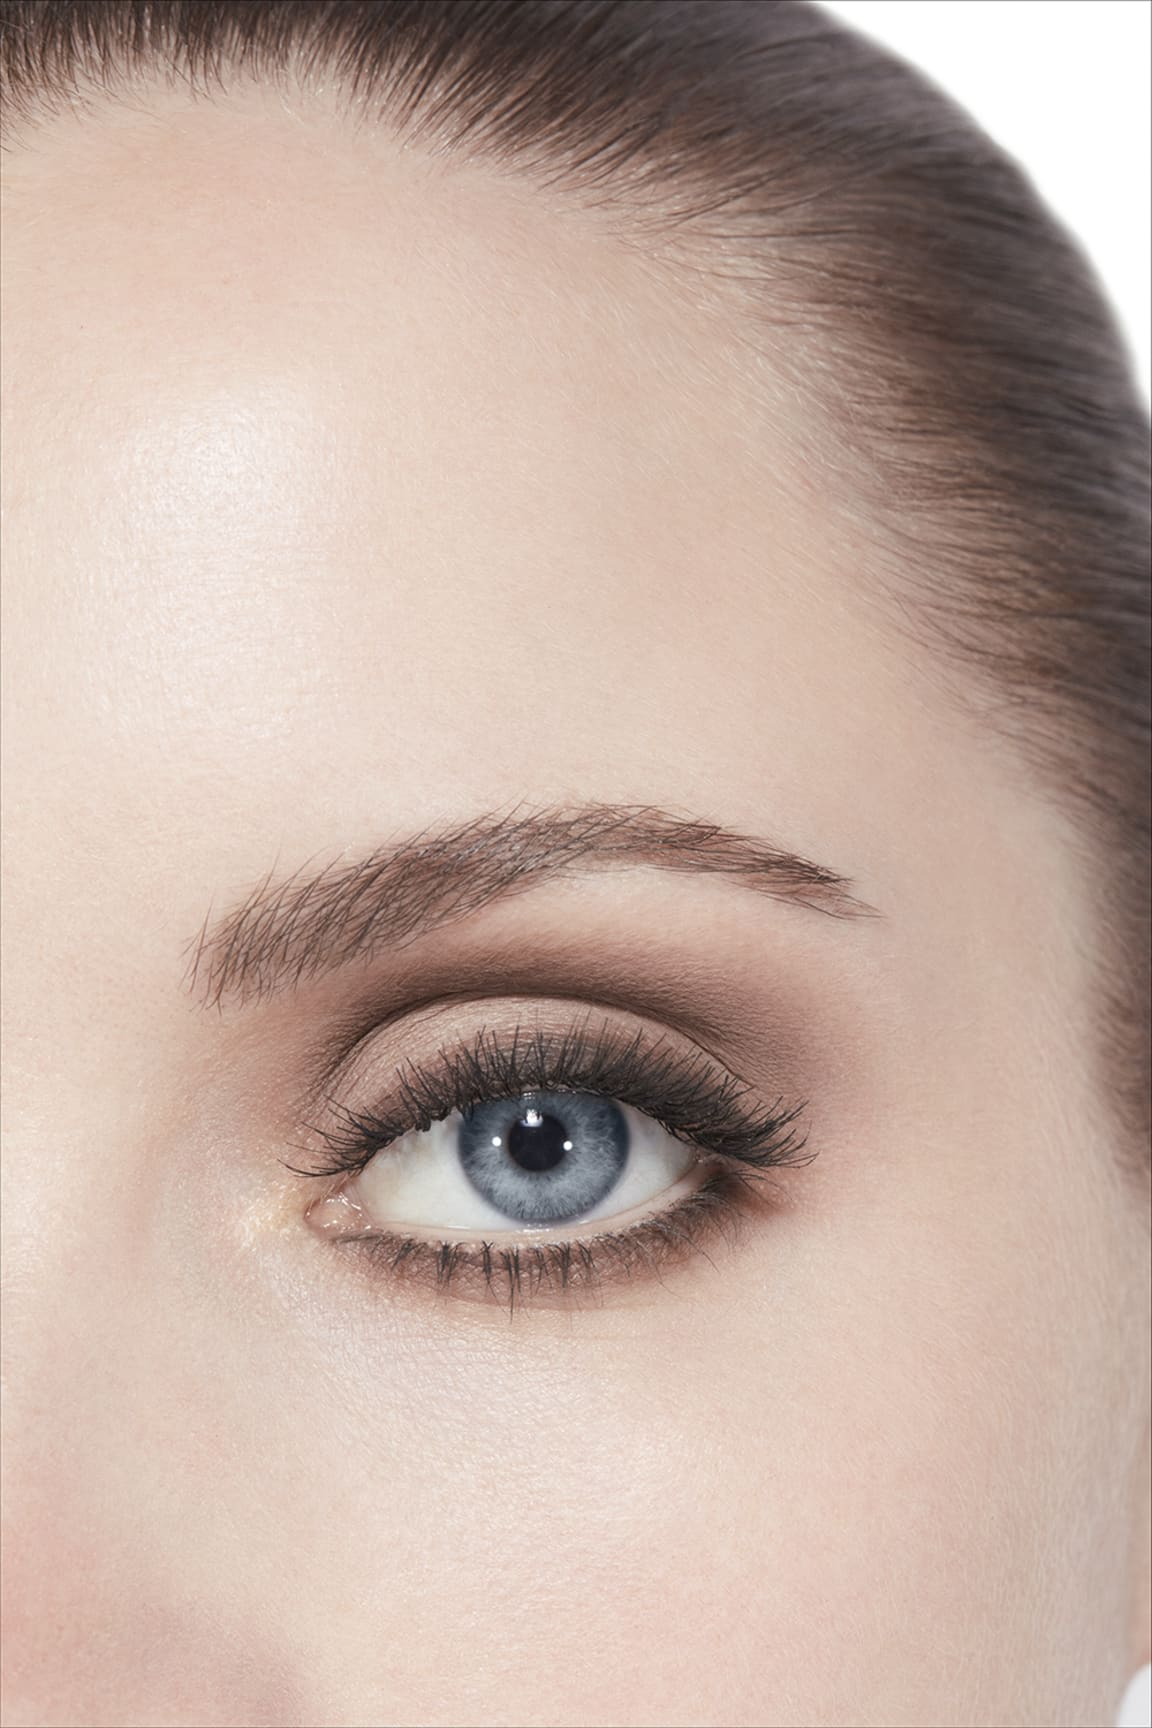 Application makeup visual 3 - LES 4 OMBRES 308 - CLAIR-OBSCUR